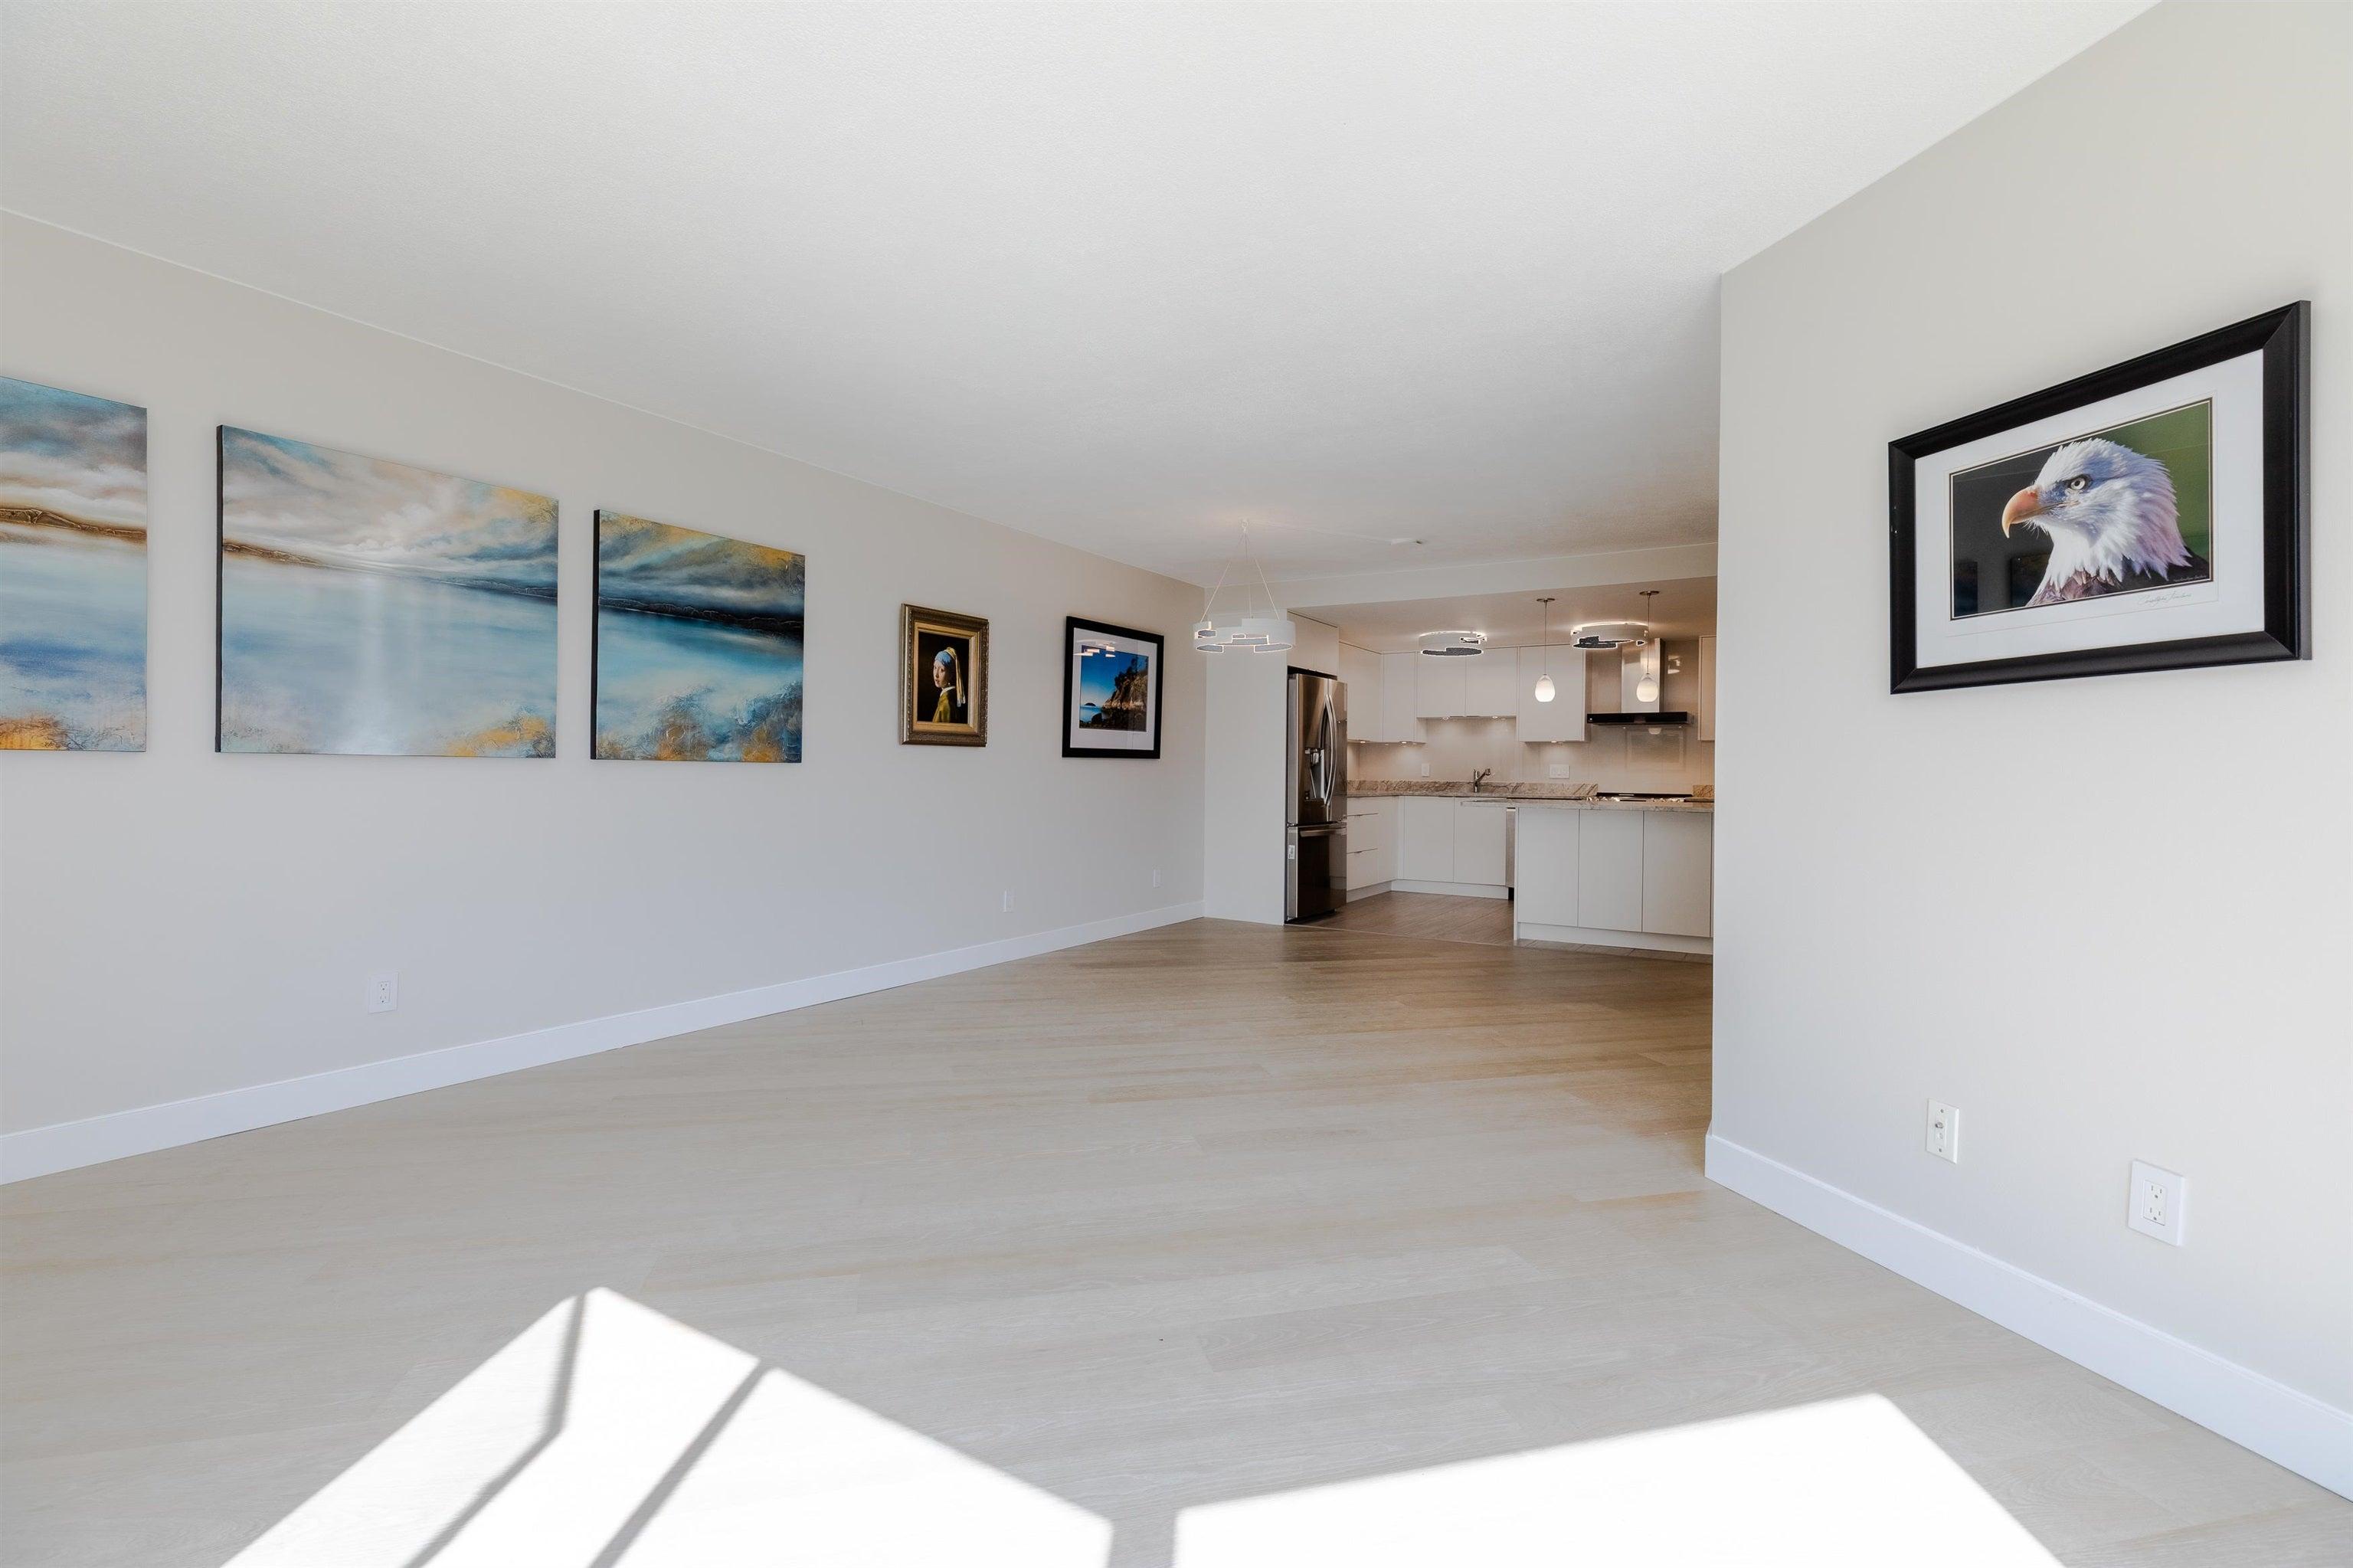 406 1450 PENNYFARTHING DRIVE - False Creek Apartment/Condo for sale, 2 Bedrooms (R2617259) - #4